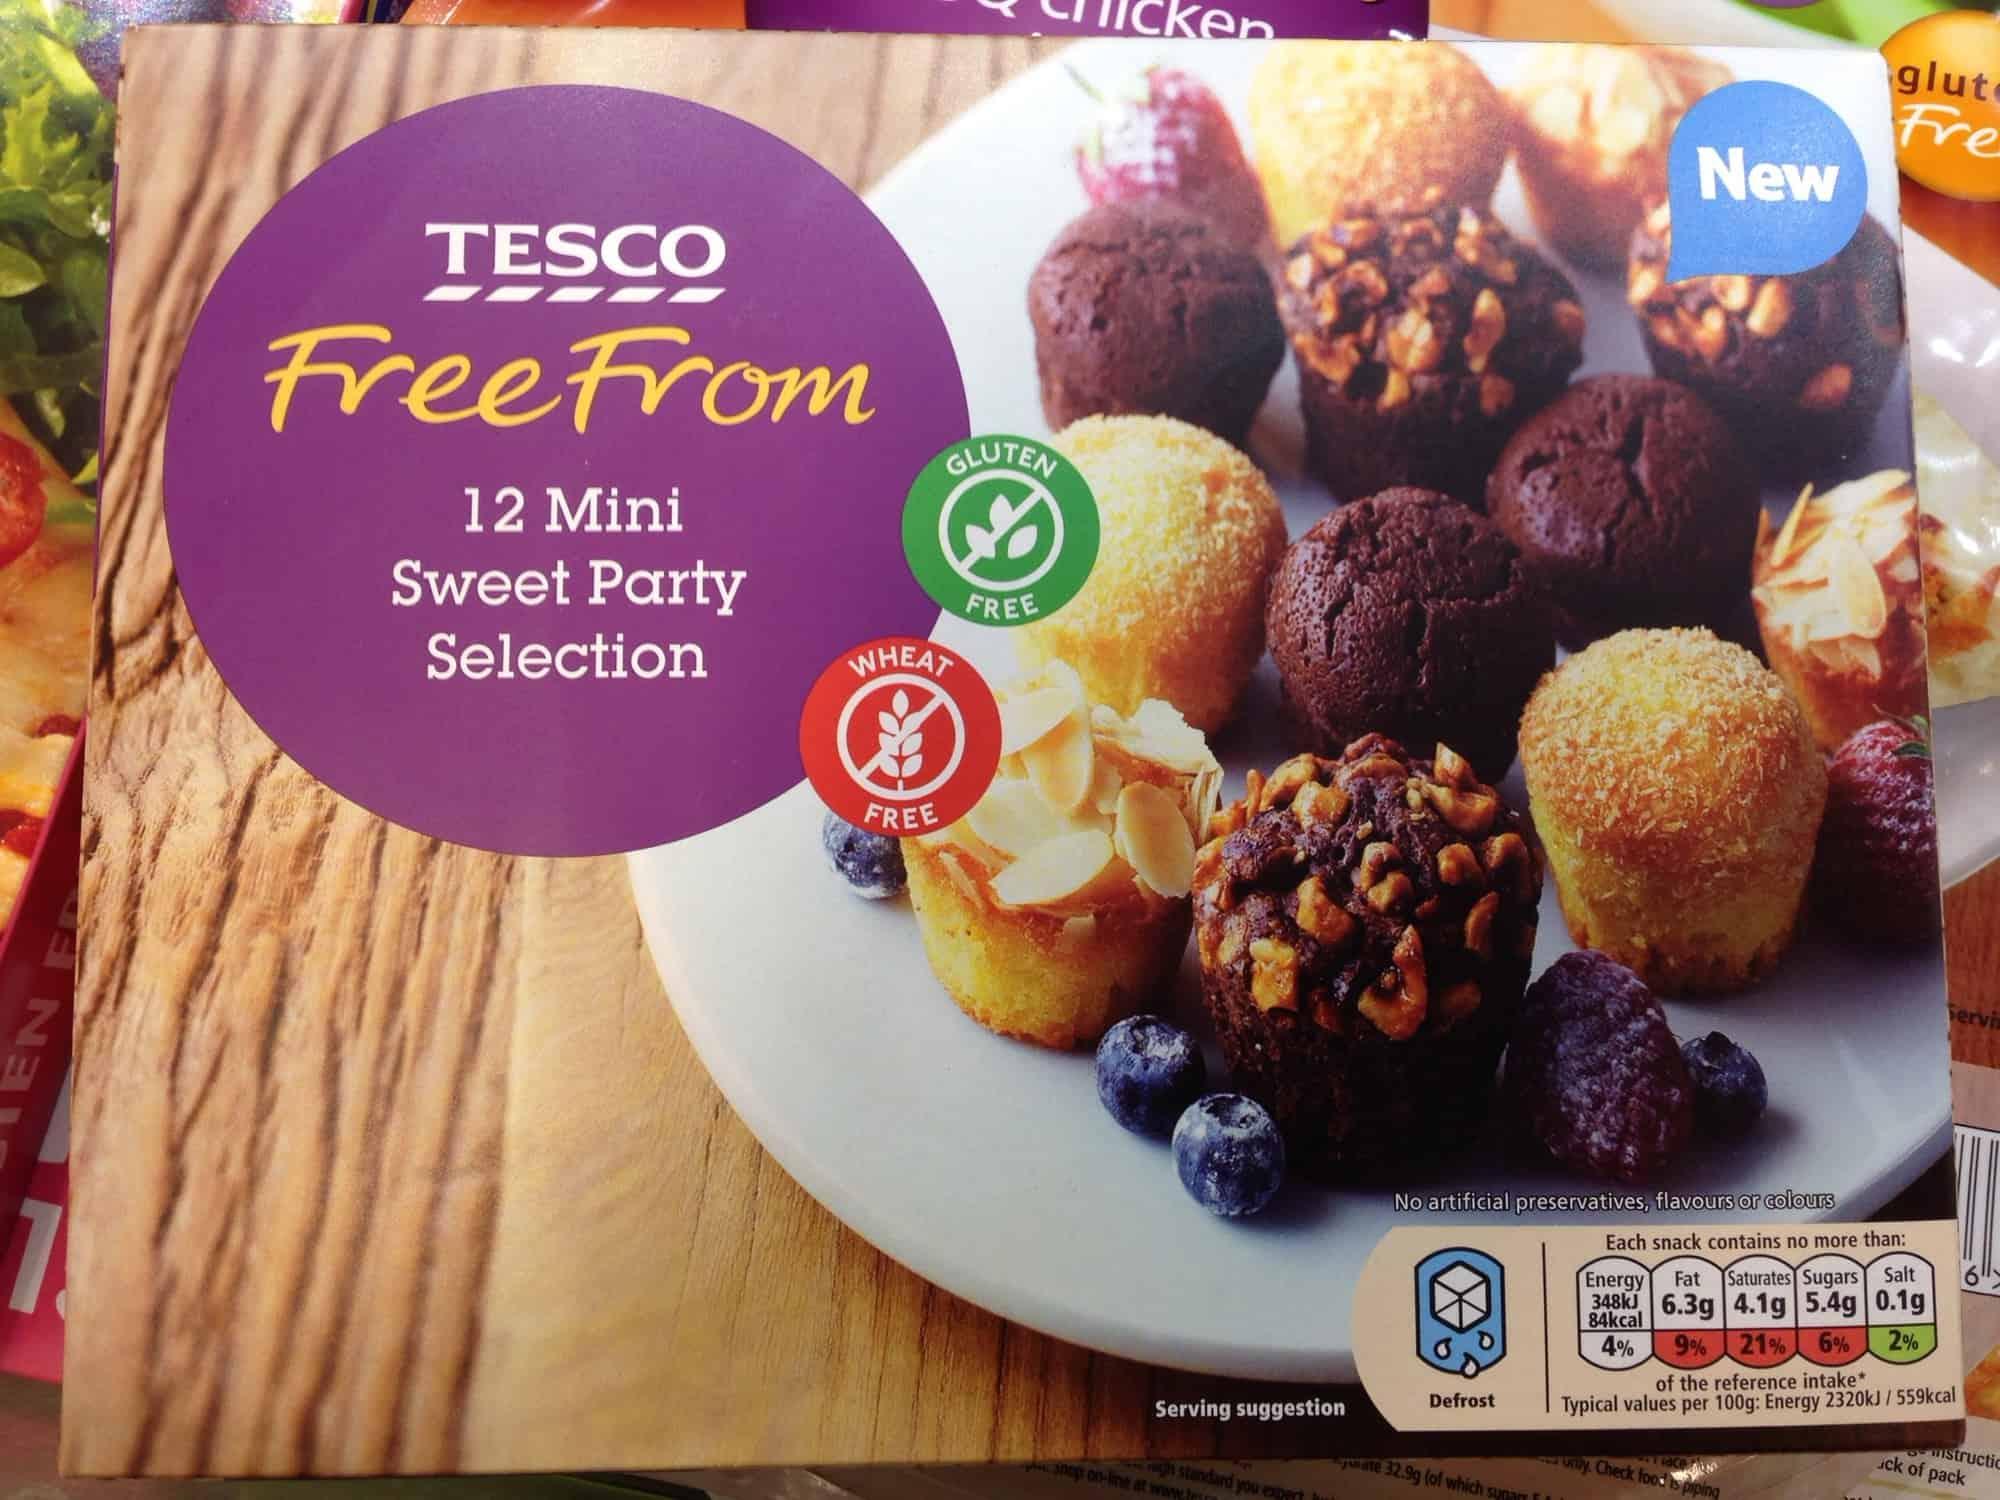 New Gluten Free Frozen Food Tesco Party Food 2014